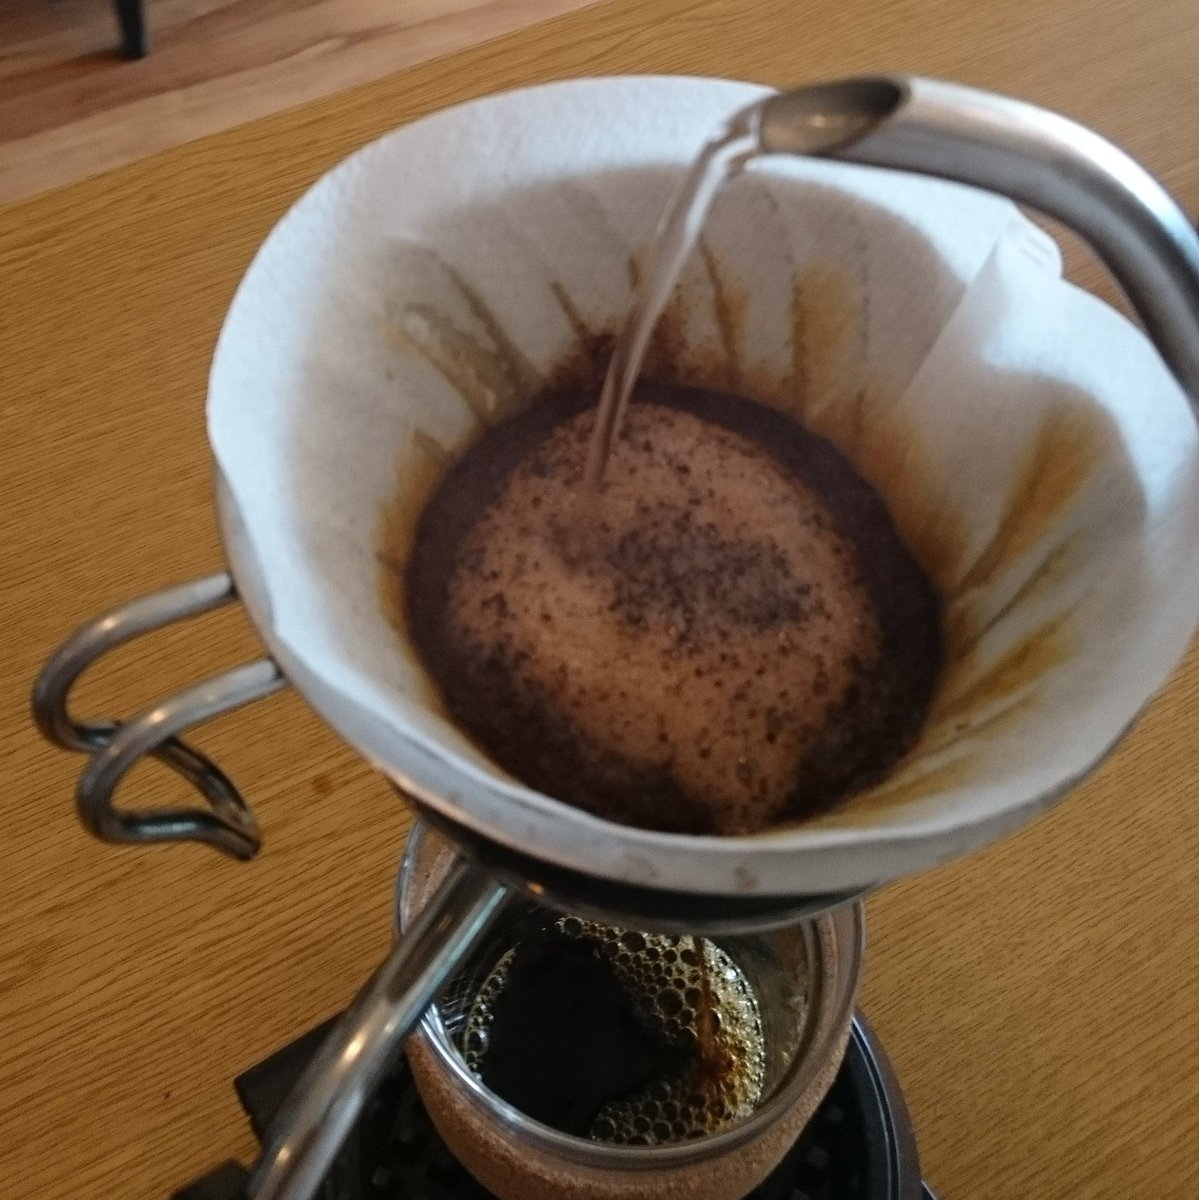 القهوه المقطره